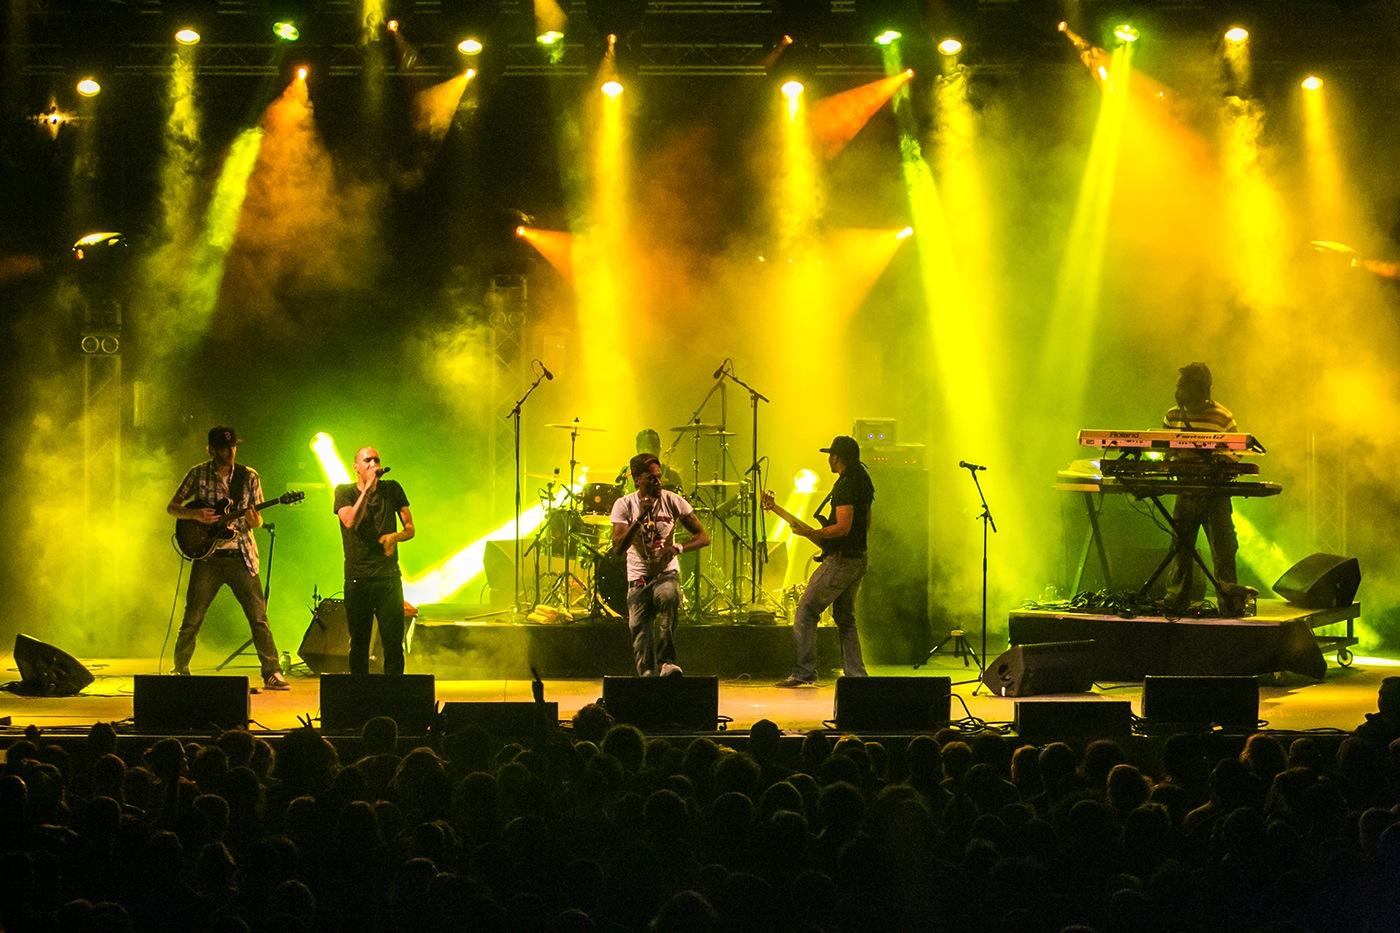 photographe-reportage-festival-rockadel-guillaume-heraud-029-small